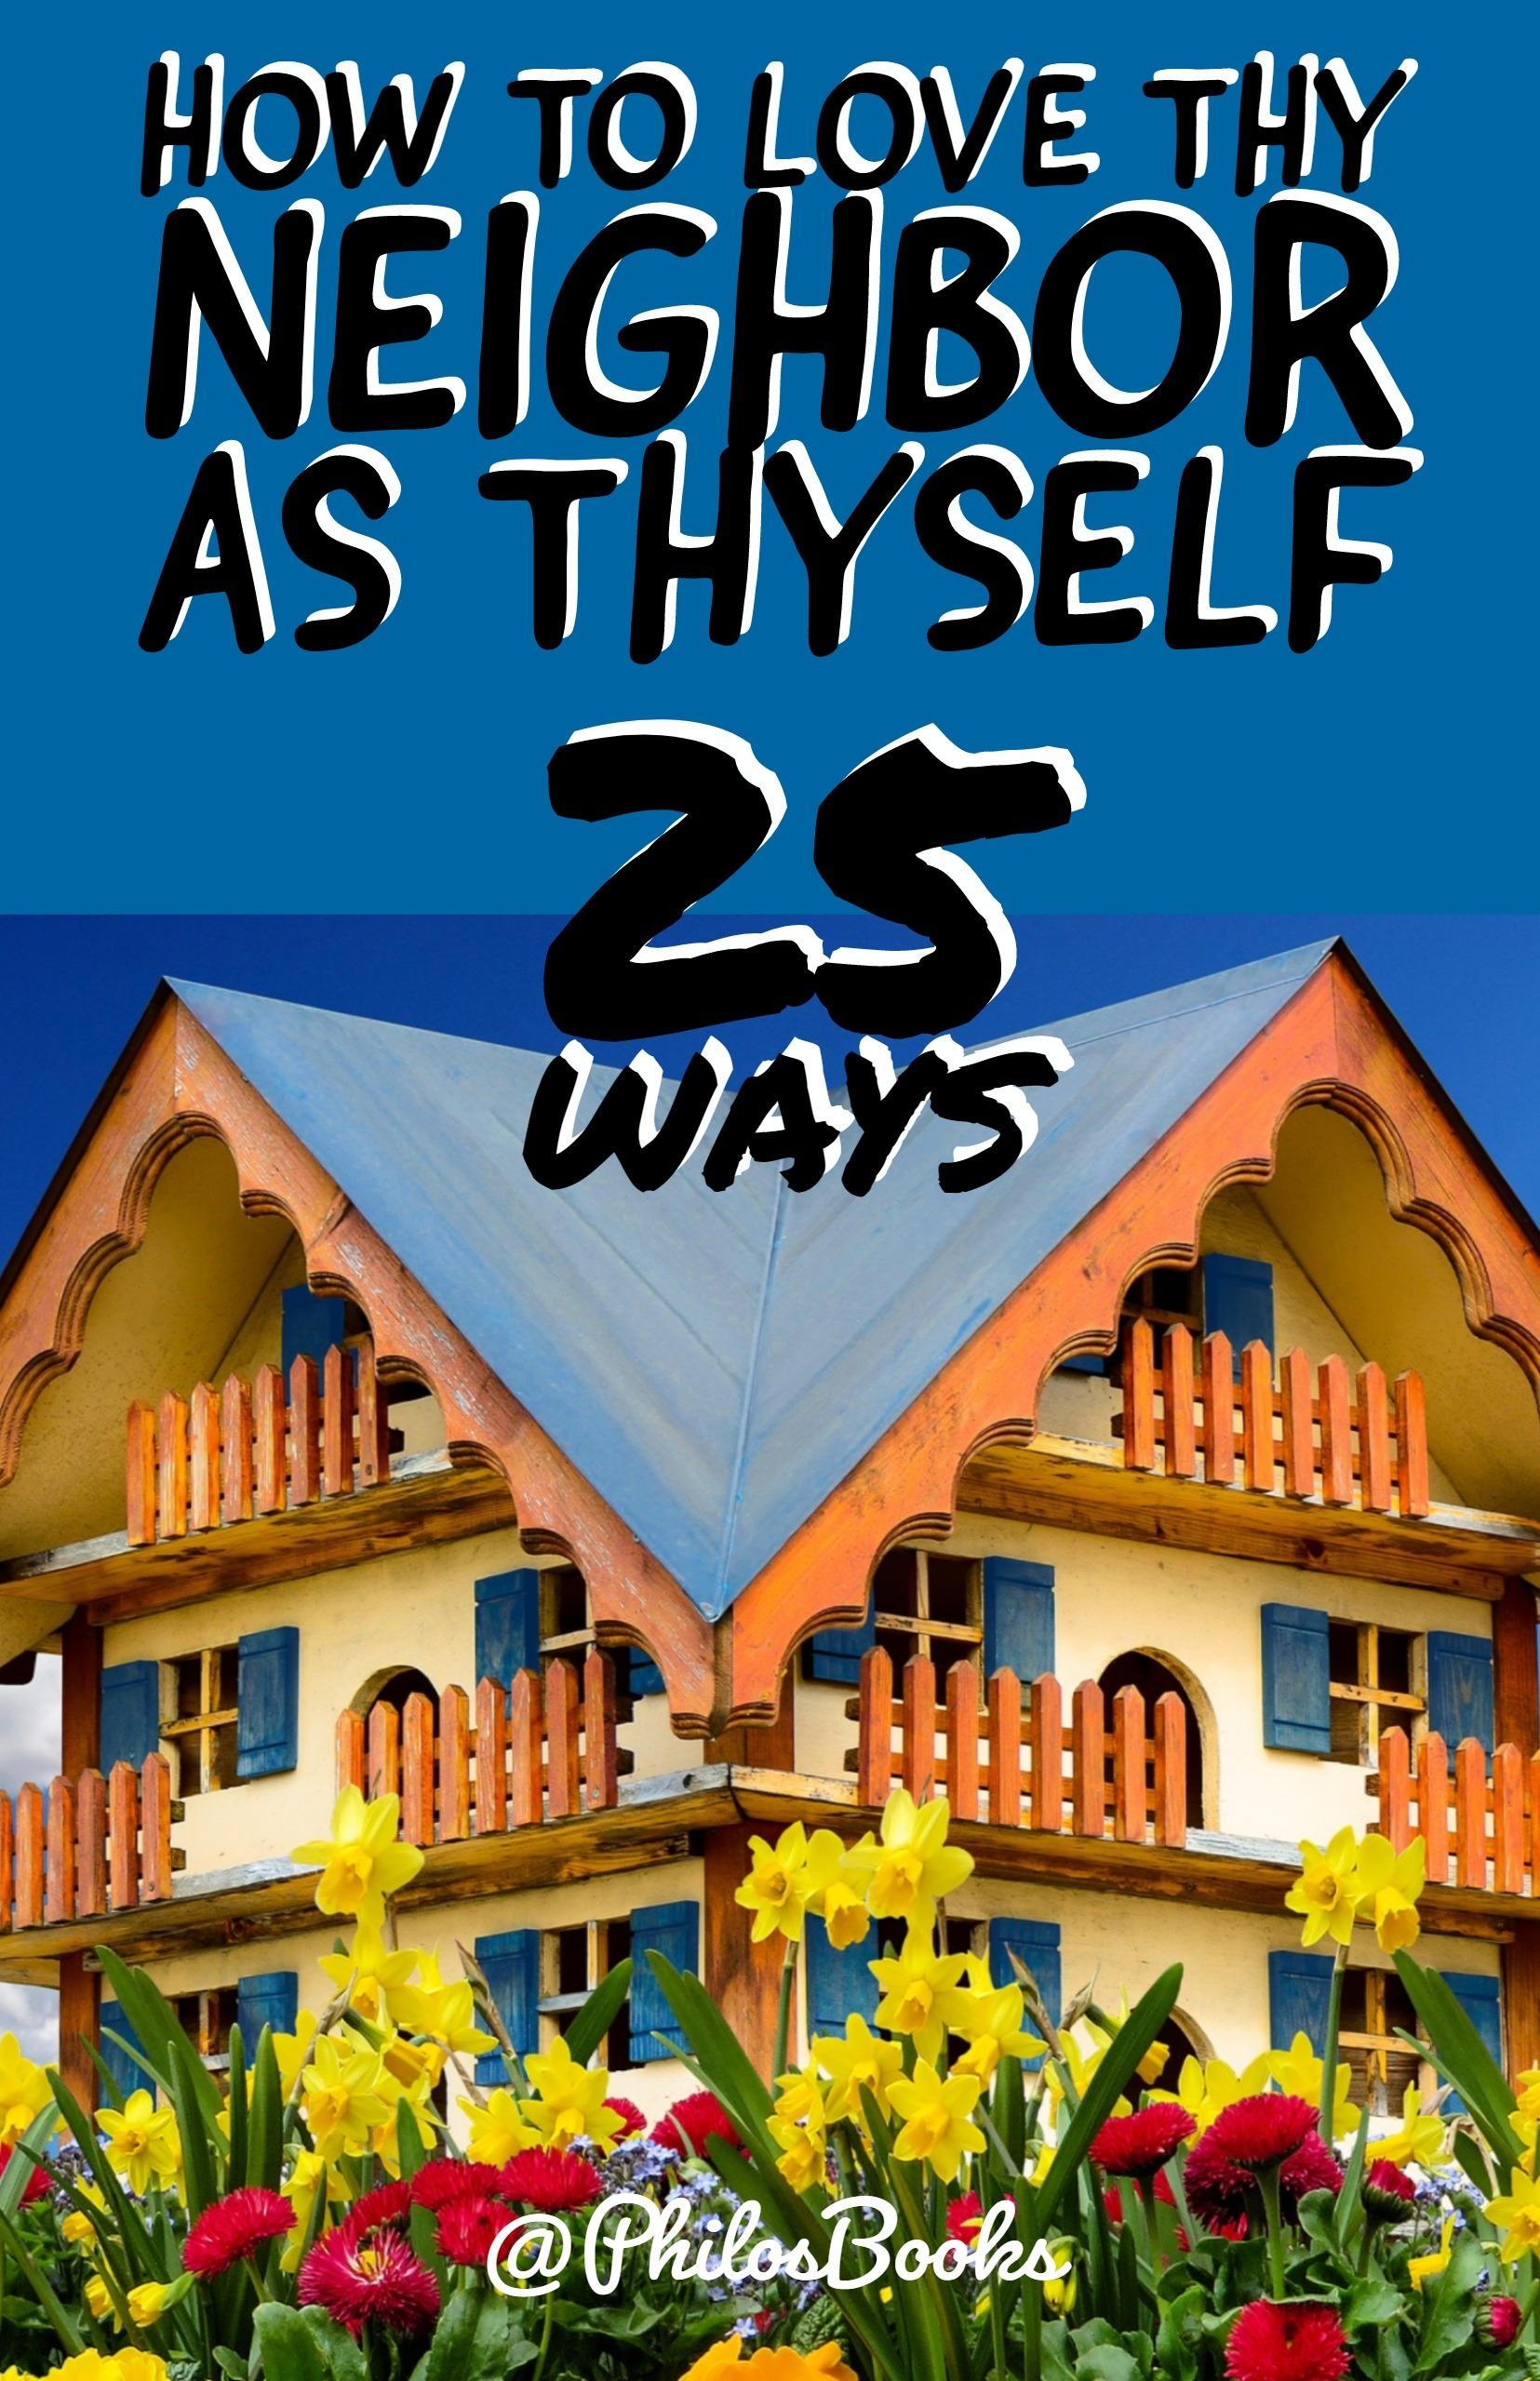 How to Love Thy Neighbor as Thyself 25 Ways